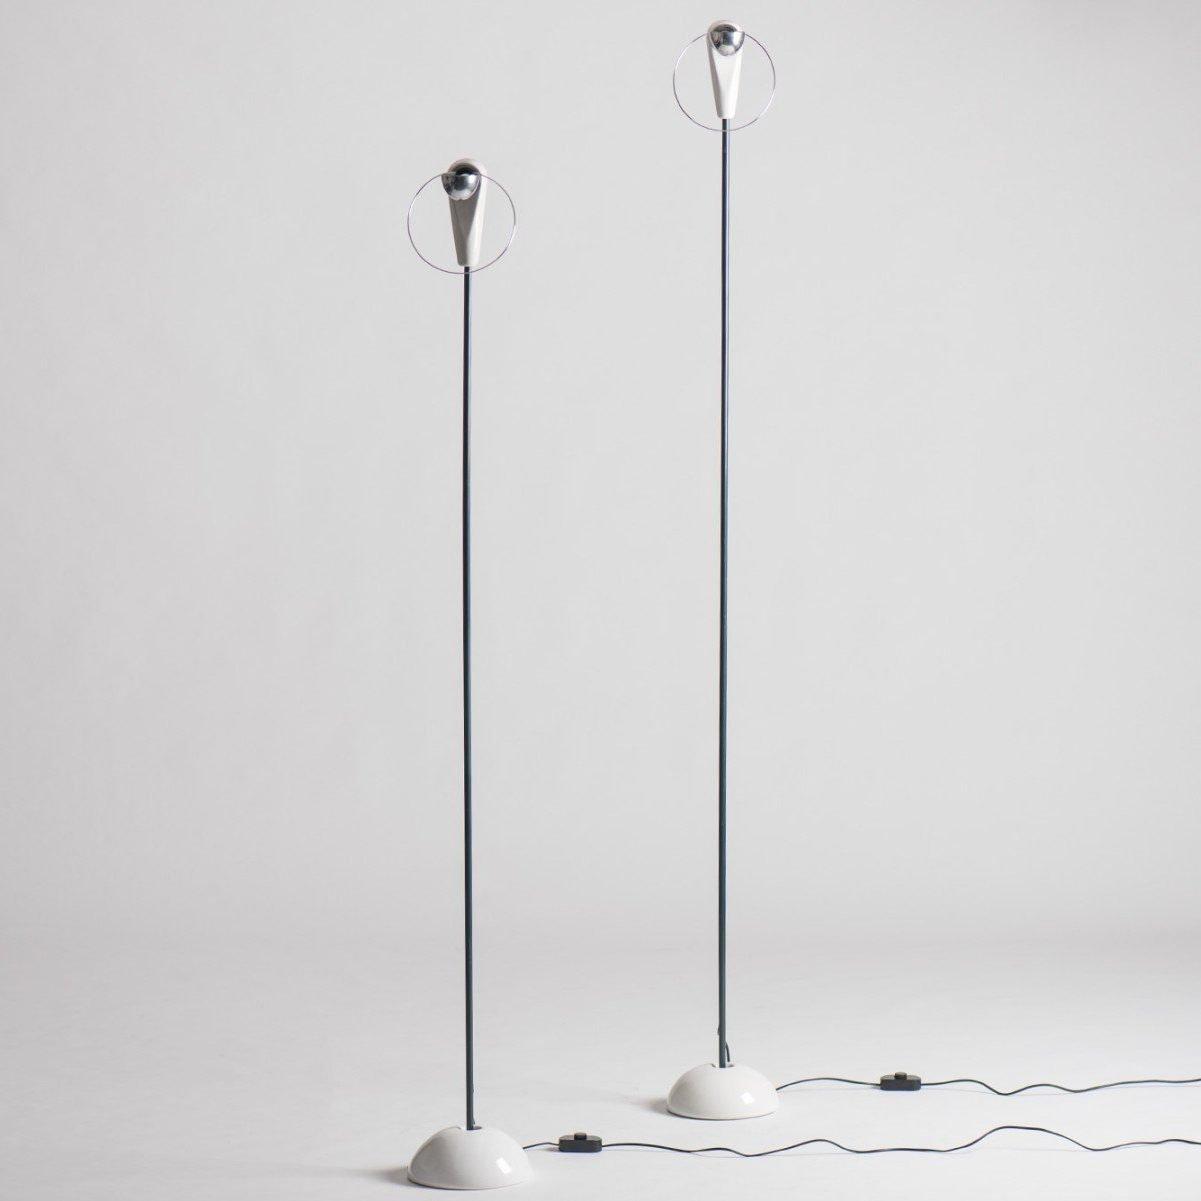 Achille Castiglioni |  Bi Bip - floor lamps